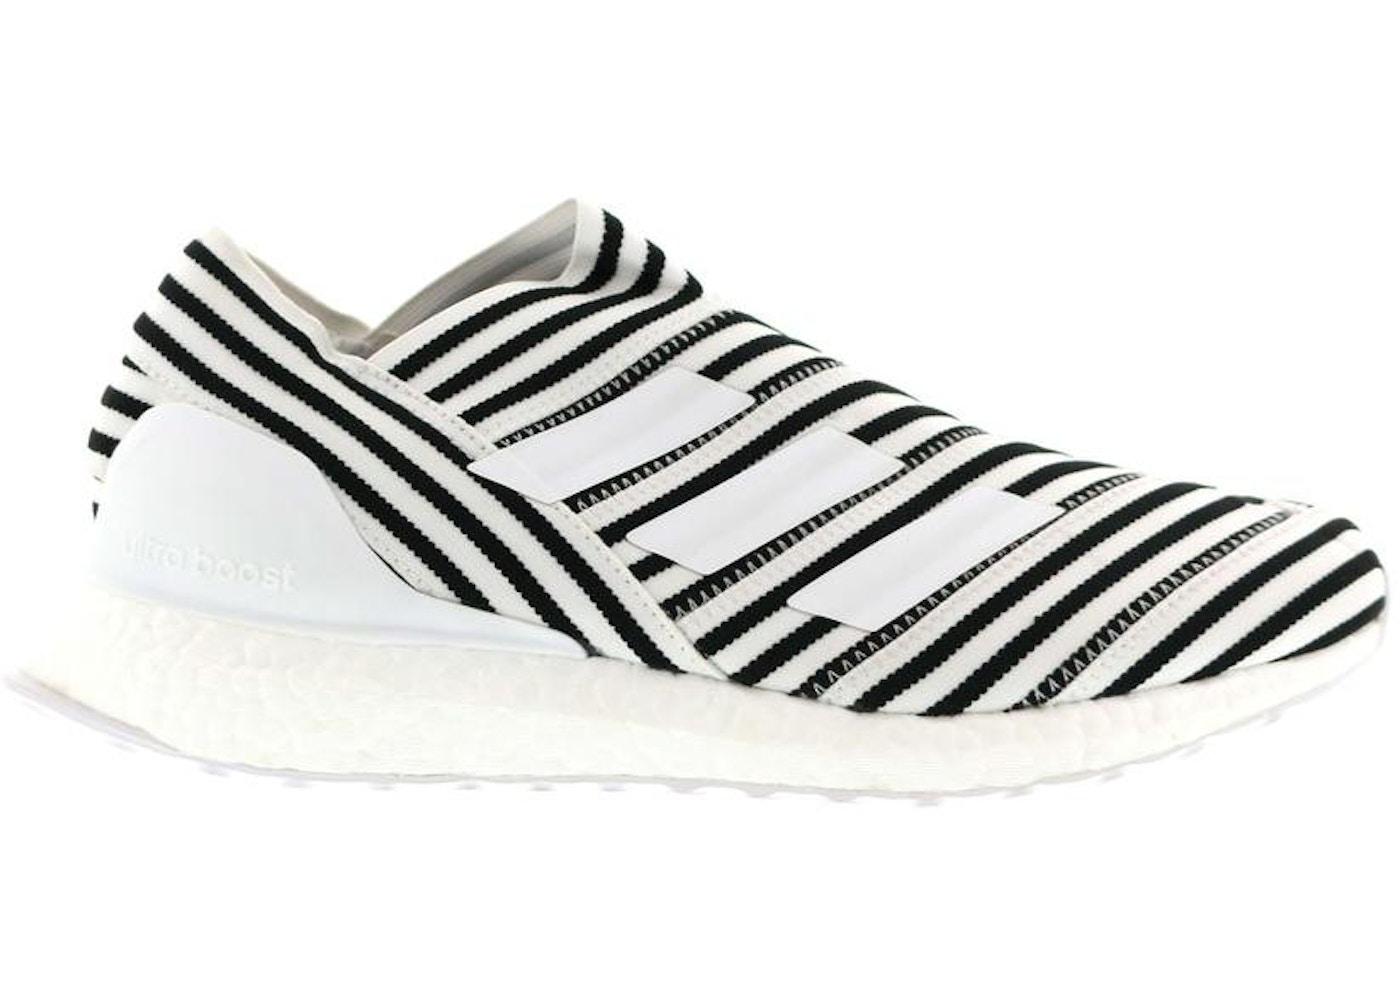 1fc035d5c adidas Nemeziz Tango 17+ Ultra Boost Agility Trainer White Black. White  Black